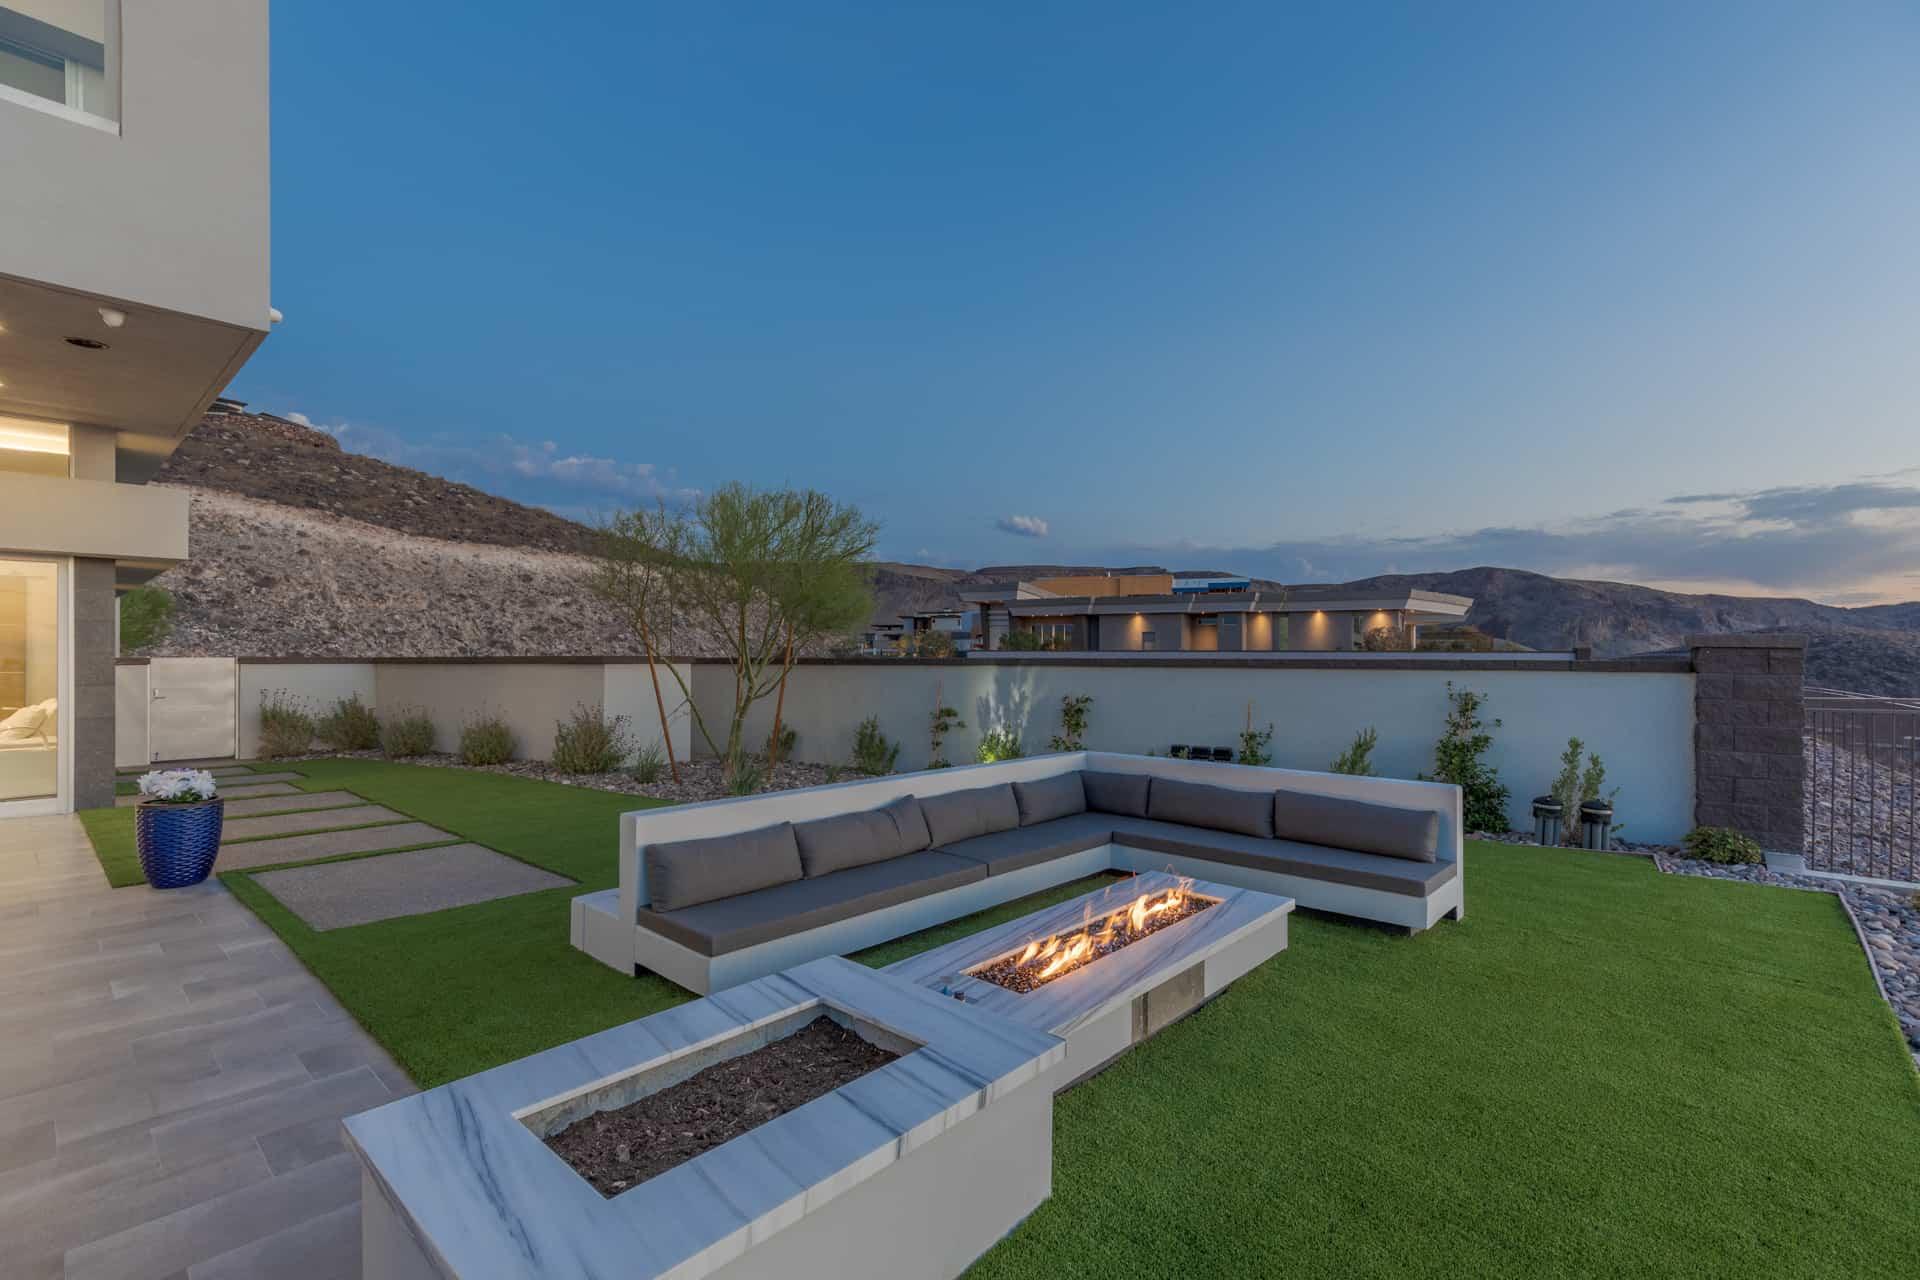 las-vegas-luxry-real-estate-realtor-rob-jensen-company-5-rockstream-drive-ascaya079